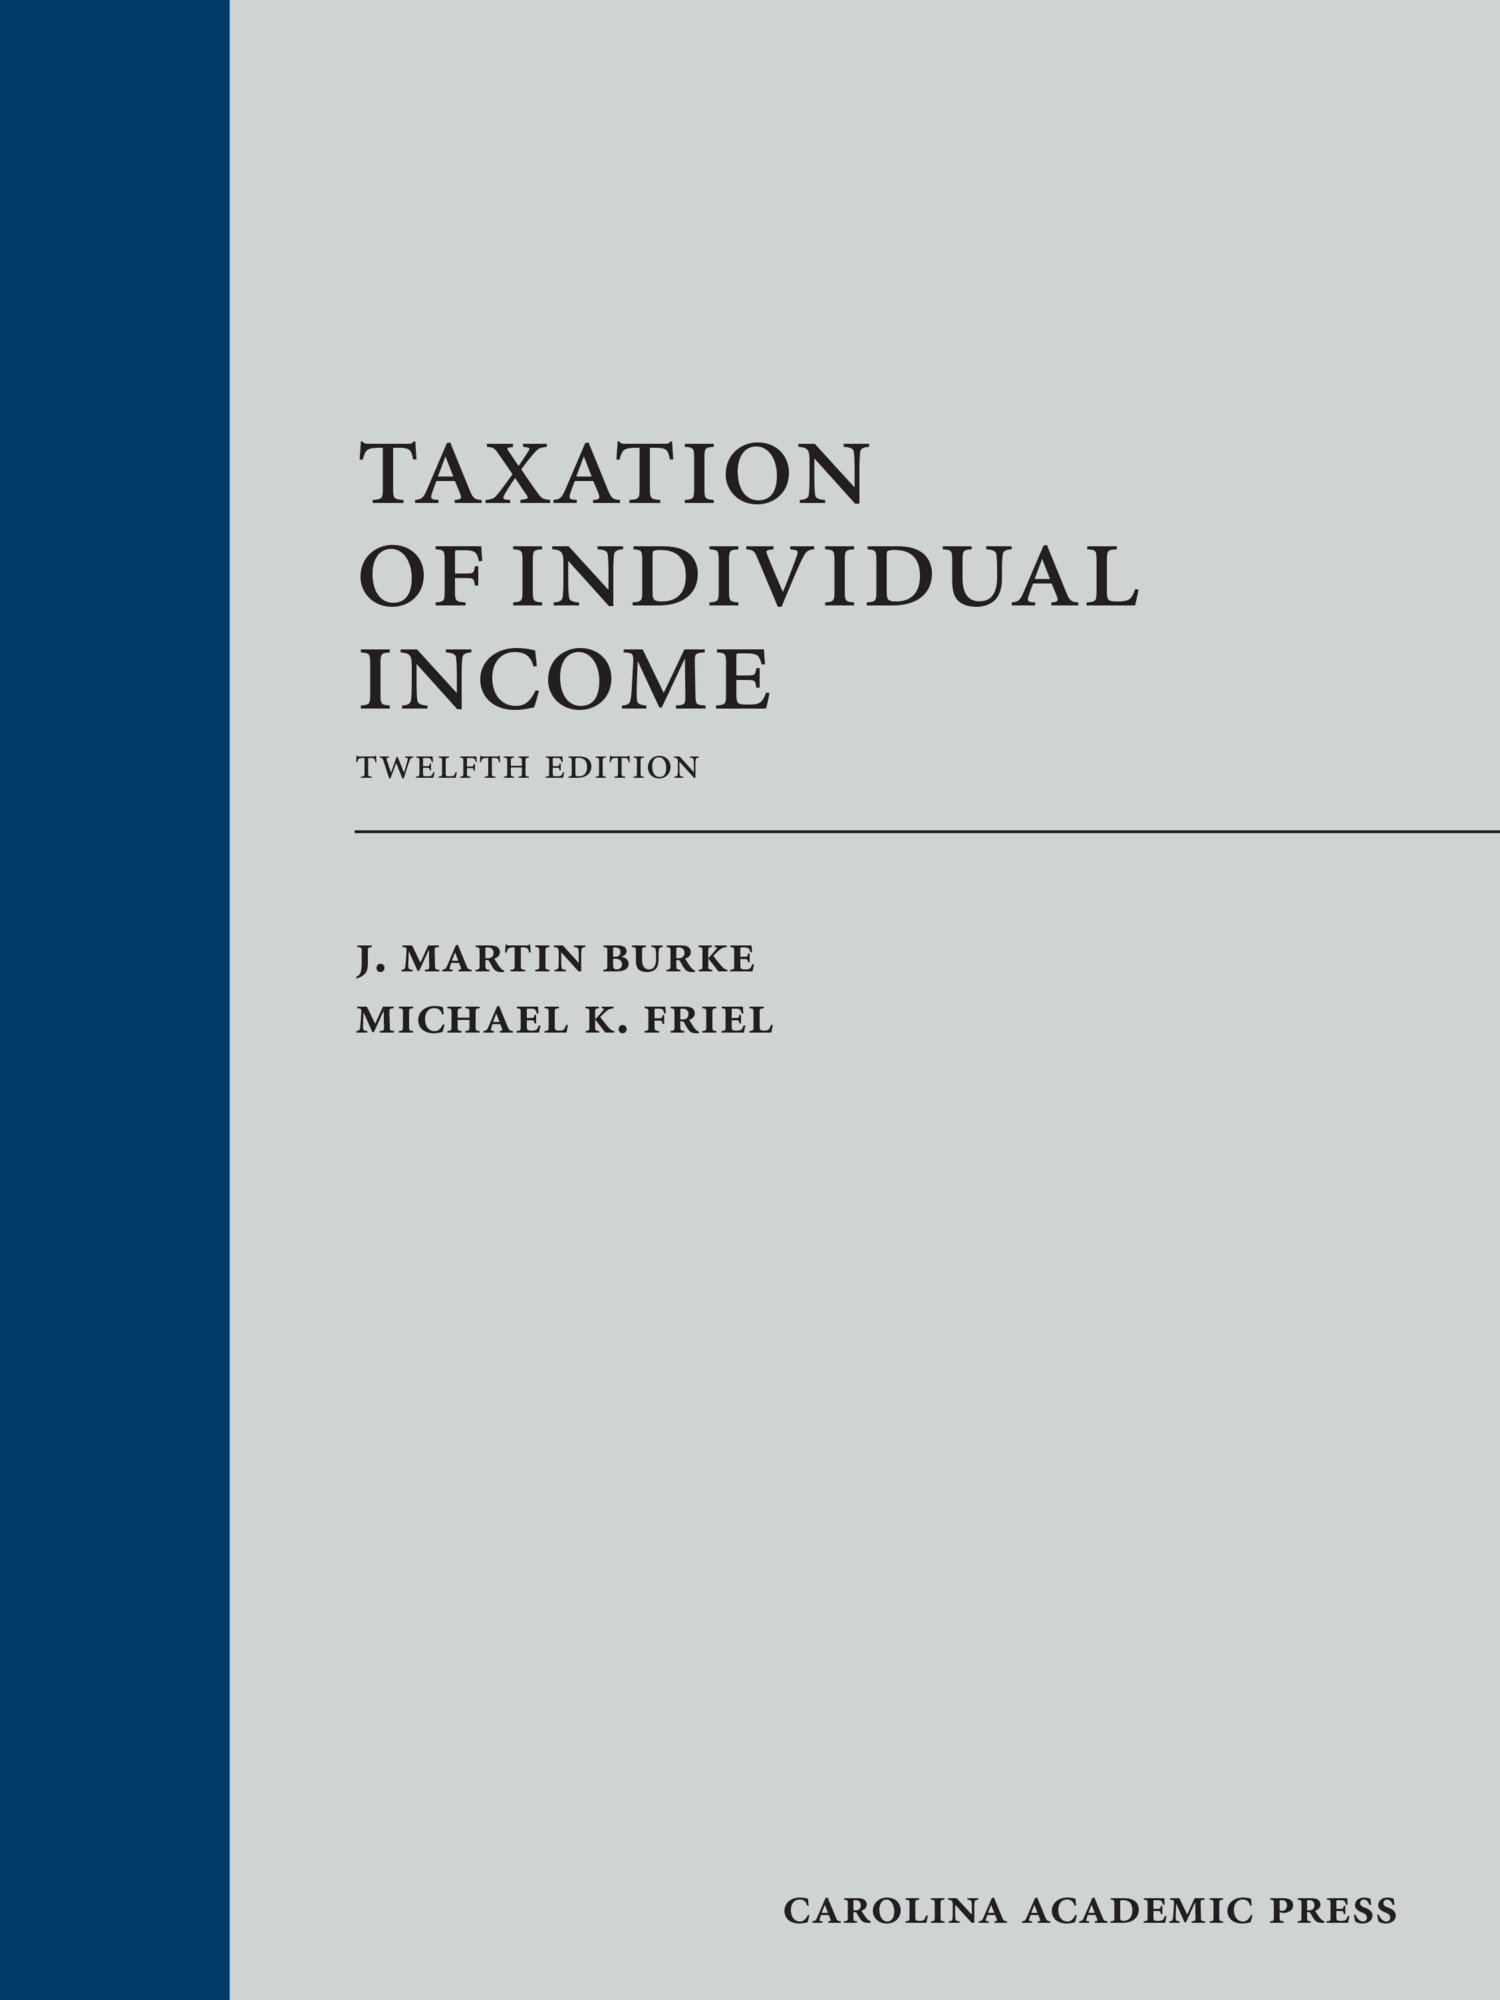 Taxation of Individual Income by Carolina Academic Press